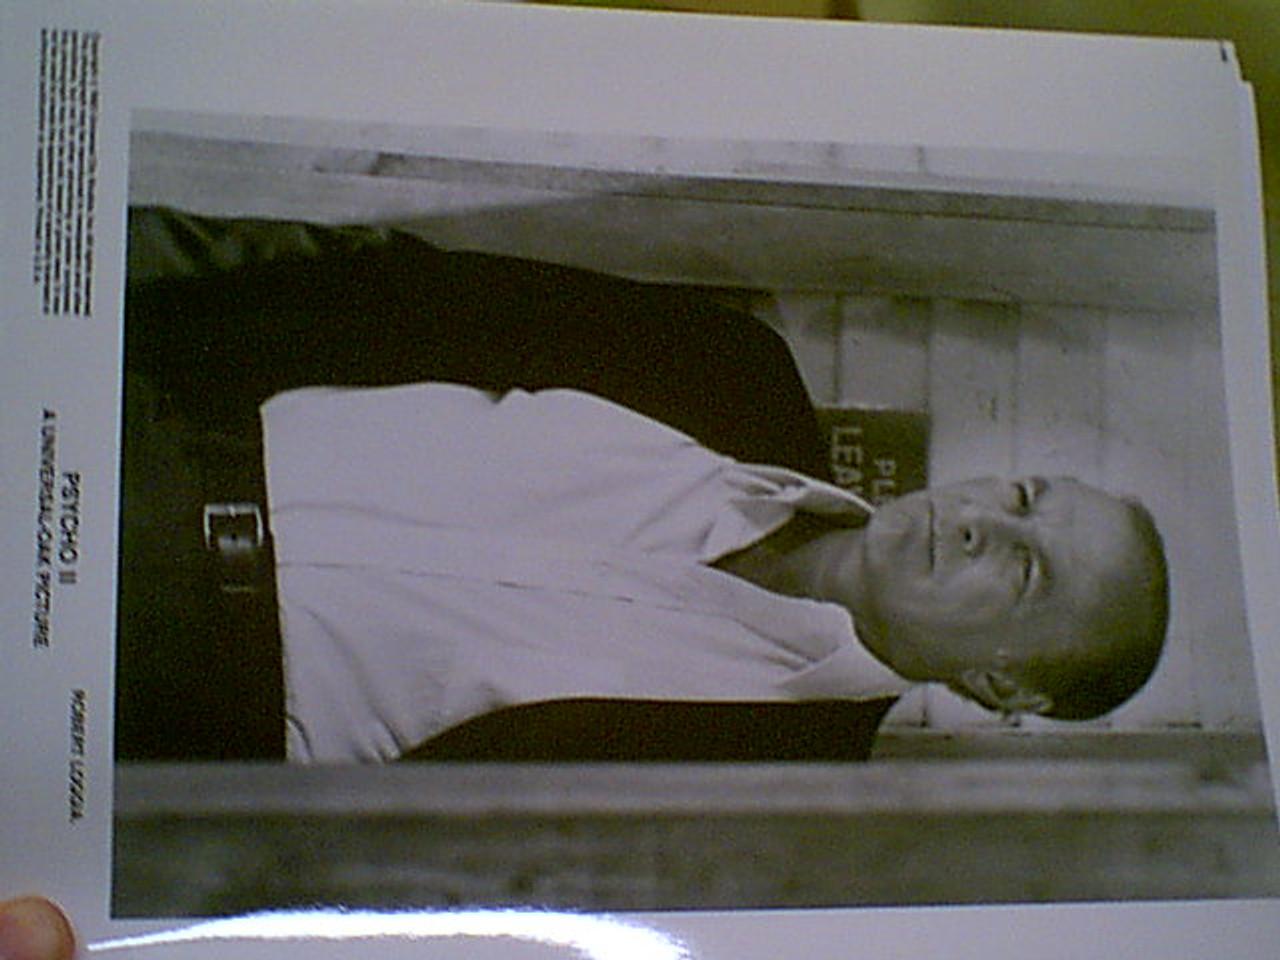 "Perkins, Tony & Robert Loggia ""Psycho Ii"" 1983 Press Kit Signed Autograph 15 Photos"